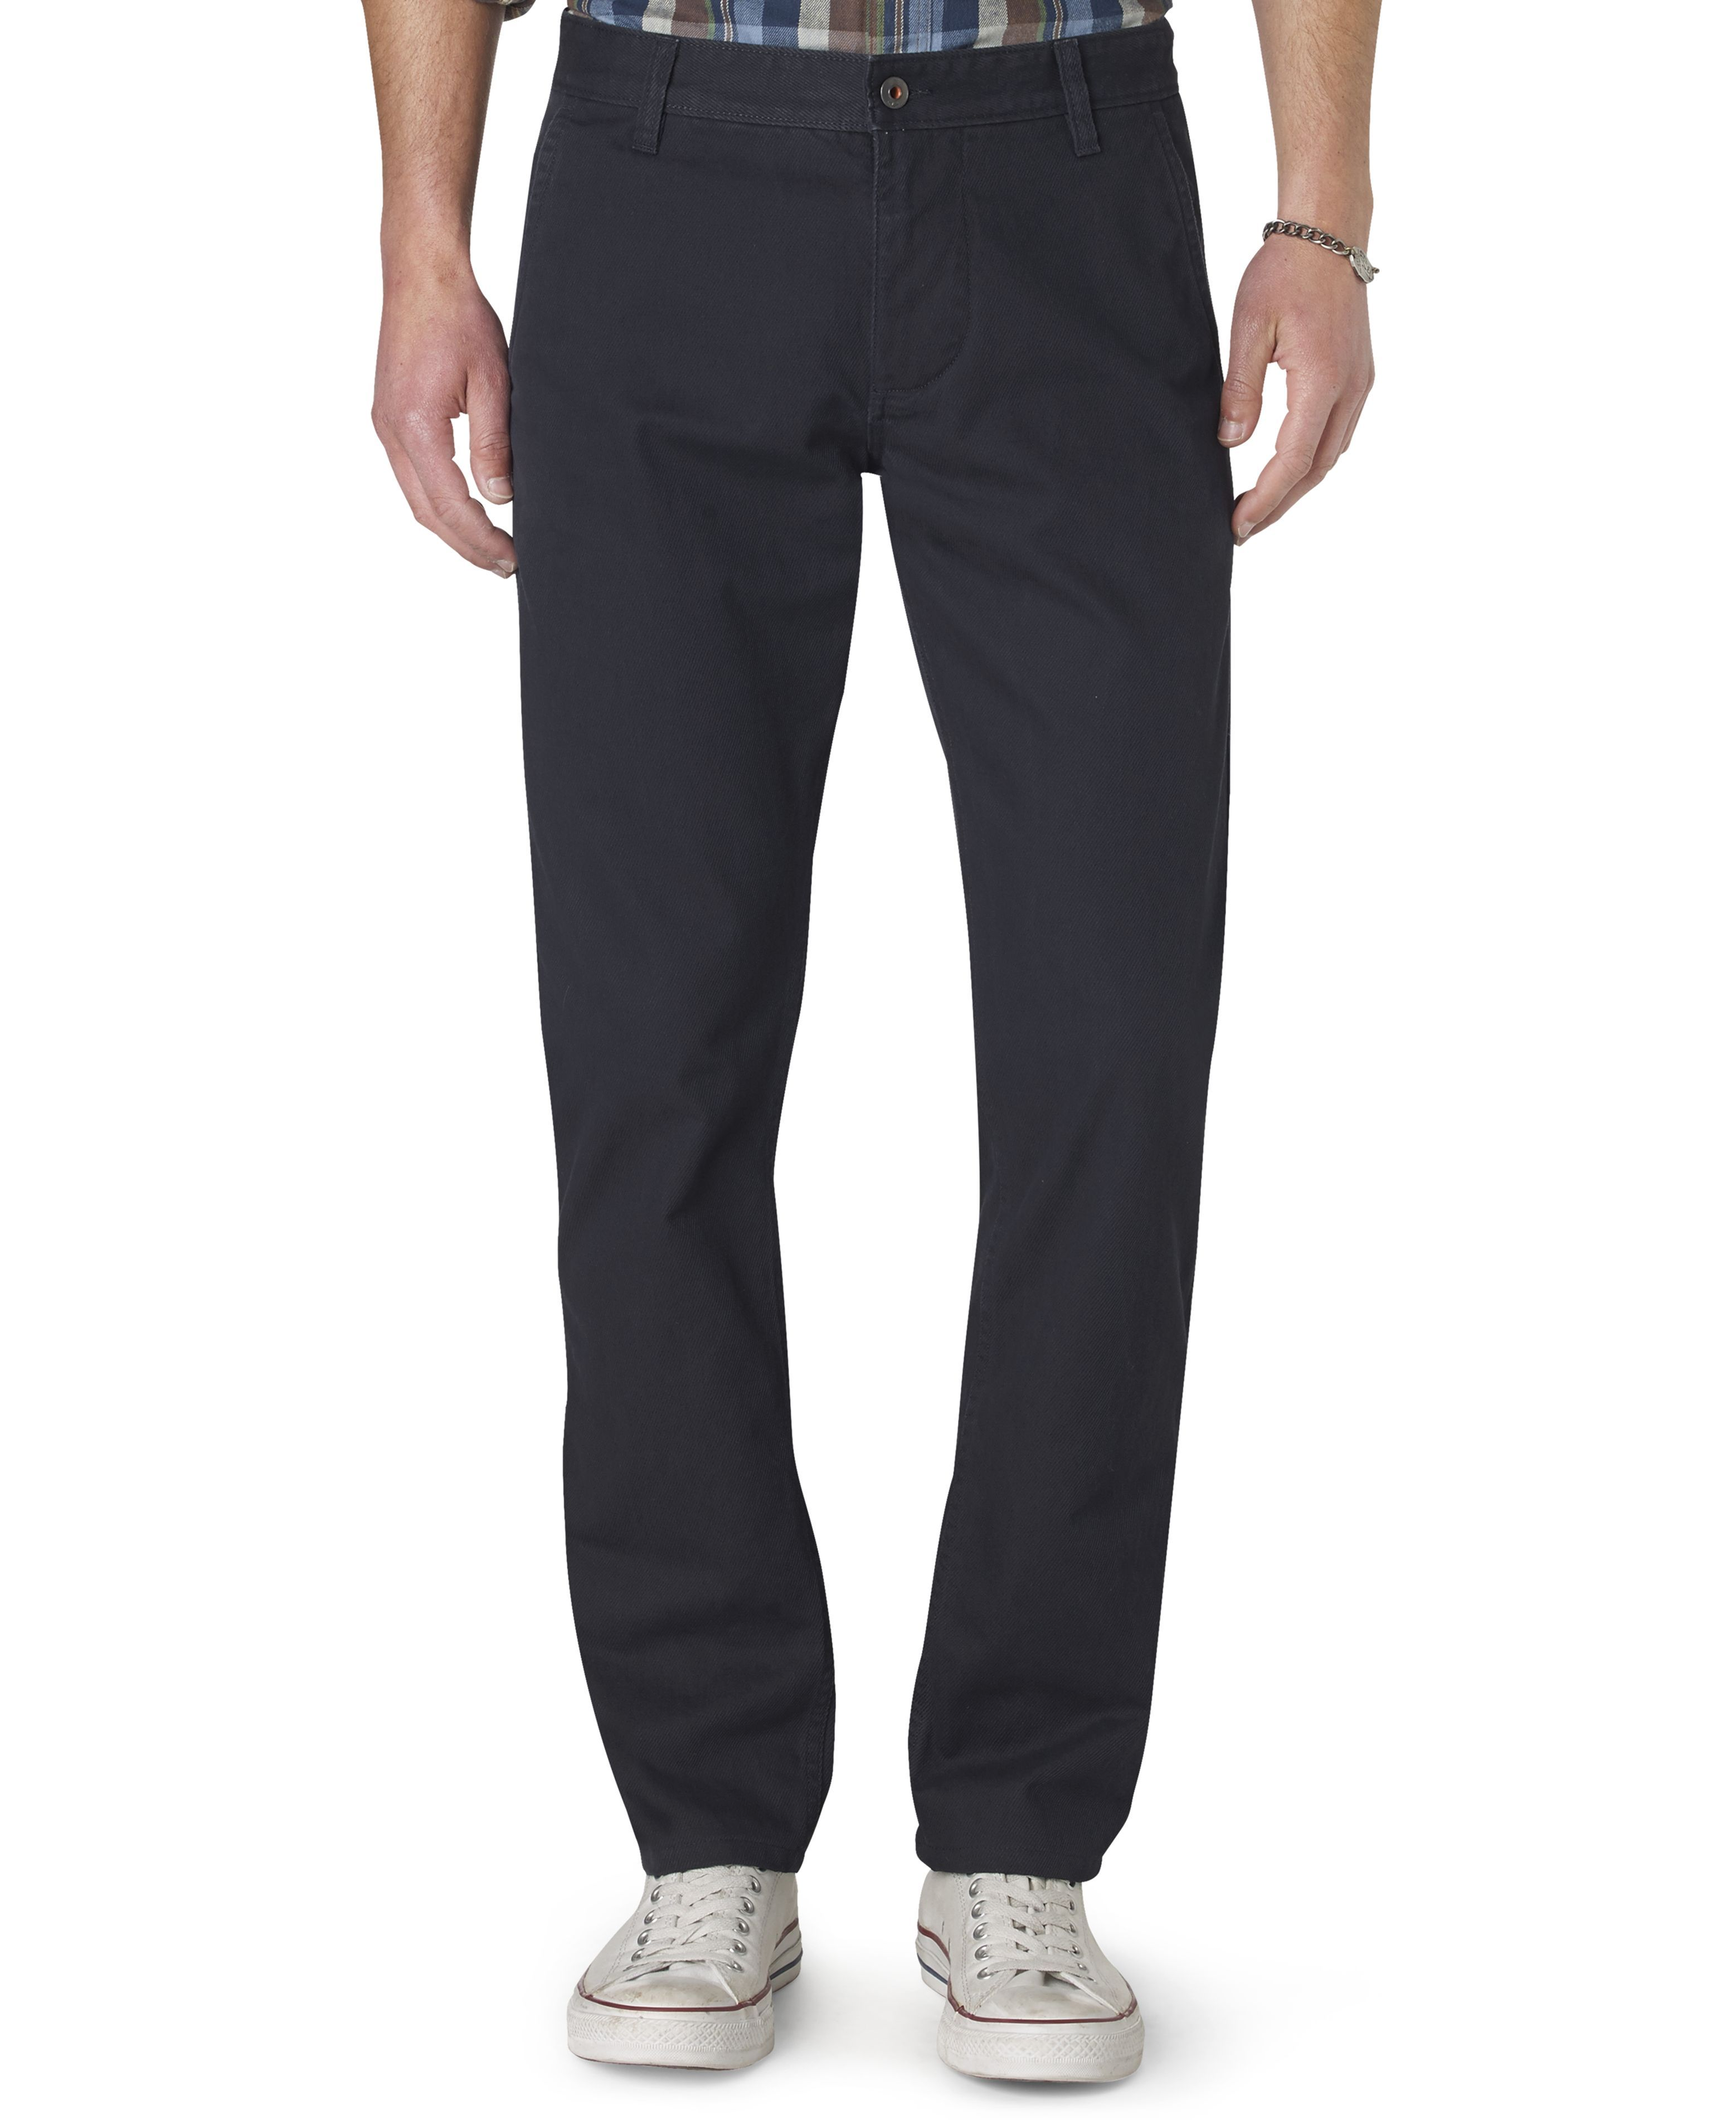 Dockers Slim Fit Alpha Khaki Textured Flat Front Pants